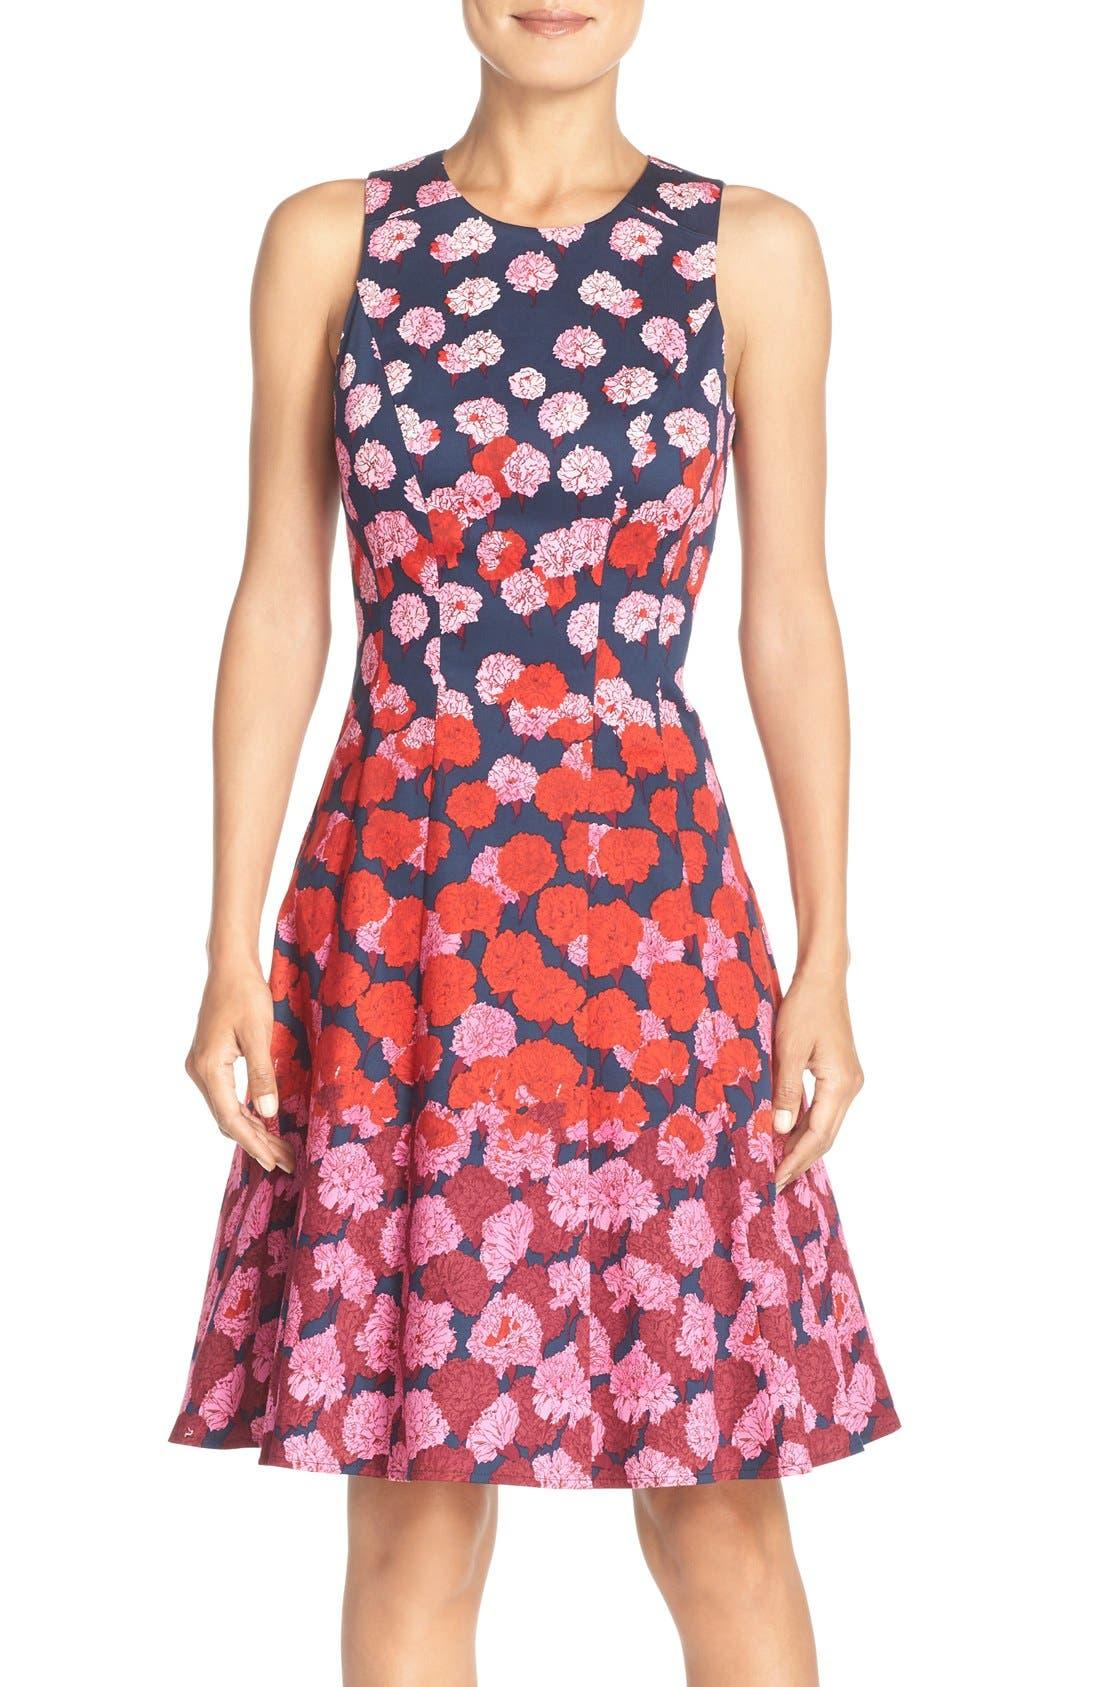 Alternate Image 1 Selected - Maggy London Floral Print Fit & Flare Dress (Regular & Petite)